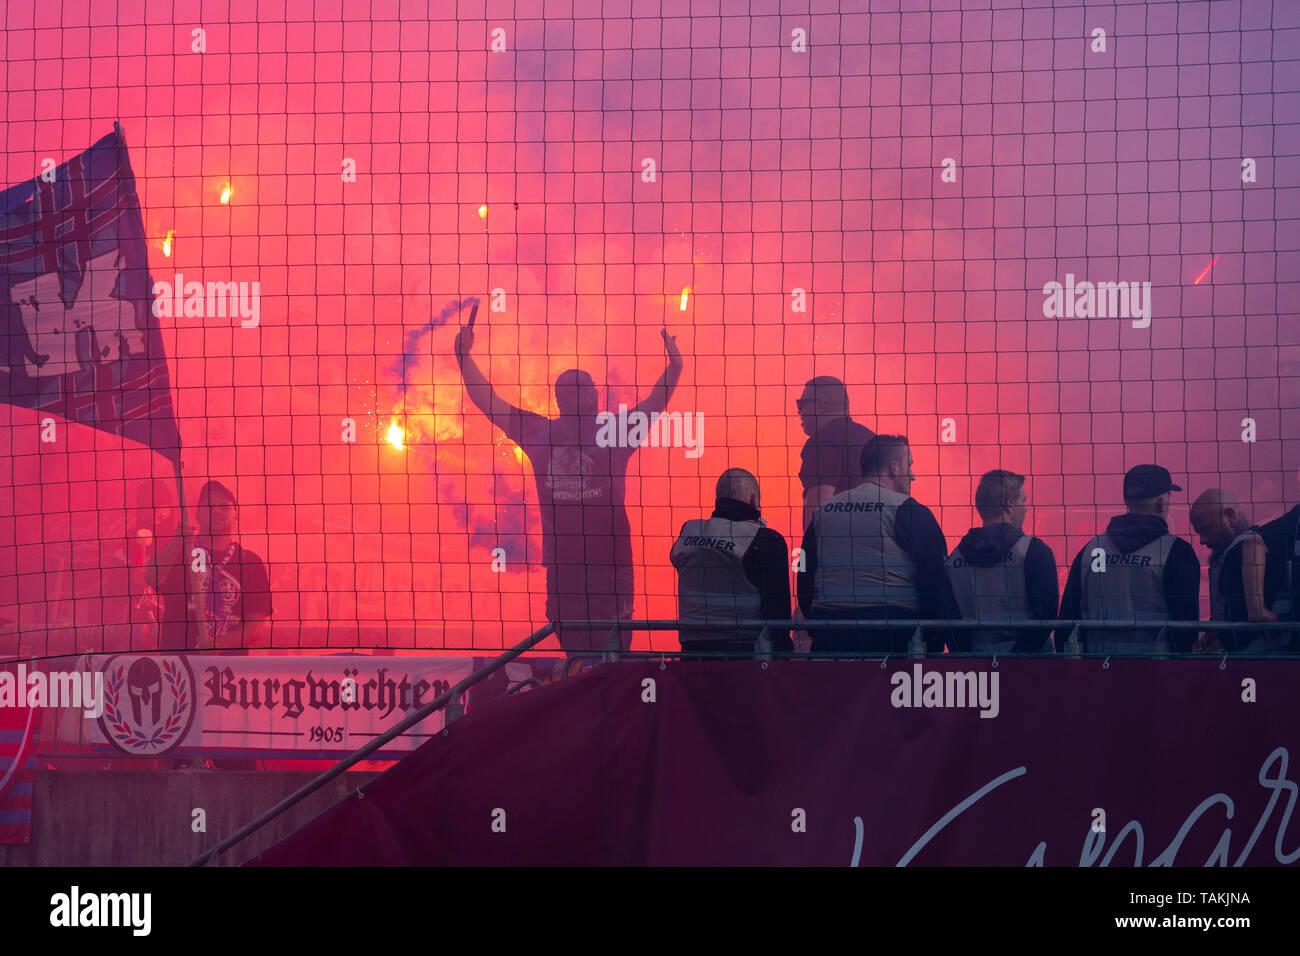 Sport, Fussball, Reviersport Niederrheinpokal, 2018/2019, Finale, Wuppertaler SV vs. KFC Uerdingen 1-2, Stadion Am Zoo in Wuppertal, Zuschauer, Uerdinger Fussballfans, Gaesteblock, Abbrennen von Pyrotechnik, Rauch, Dunst, Nebel, sports, football, Lower Rhine Cup, 2018/2019, final, Wuppertaler SV vs. KFC Uerdingen 1-2, Stadium Am Zoo in Wuppertal, Uerdingen football fans, visitors, pyrotechnics, smoke-bombs, haze, misty *** Local Caption *** sports, football, Lower Rhine Cup, 2018/2019, final, Wuppertaler SV vs. KFC Uerdingen 1-2, Stadium Am Zoo in Wuppertal, Uerdingen football fans, visitors,  - Stock Image